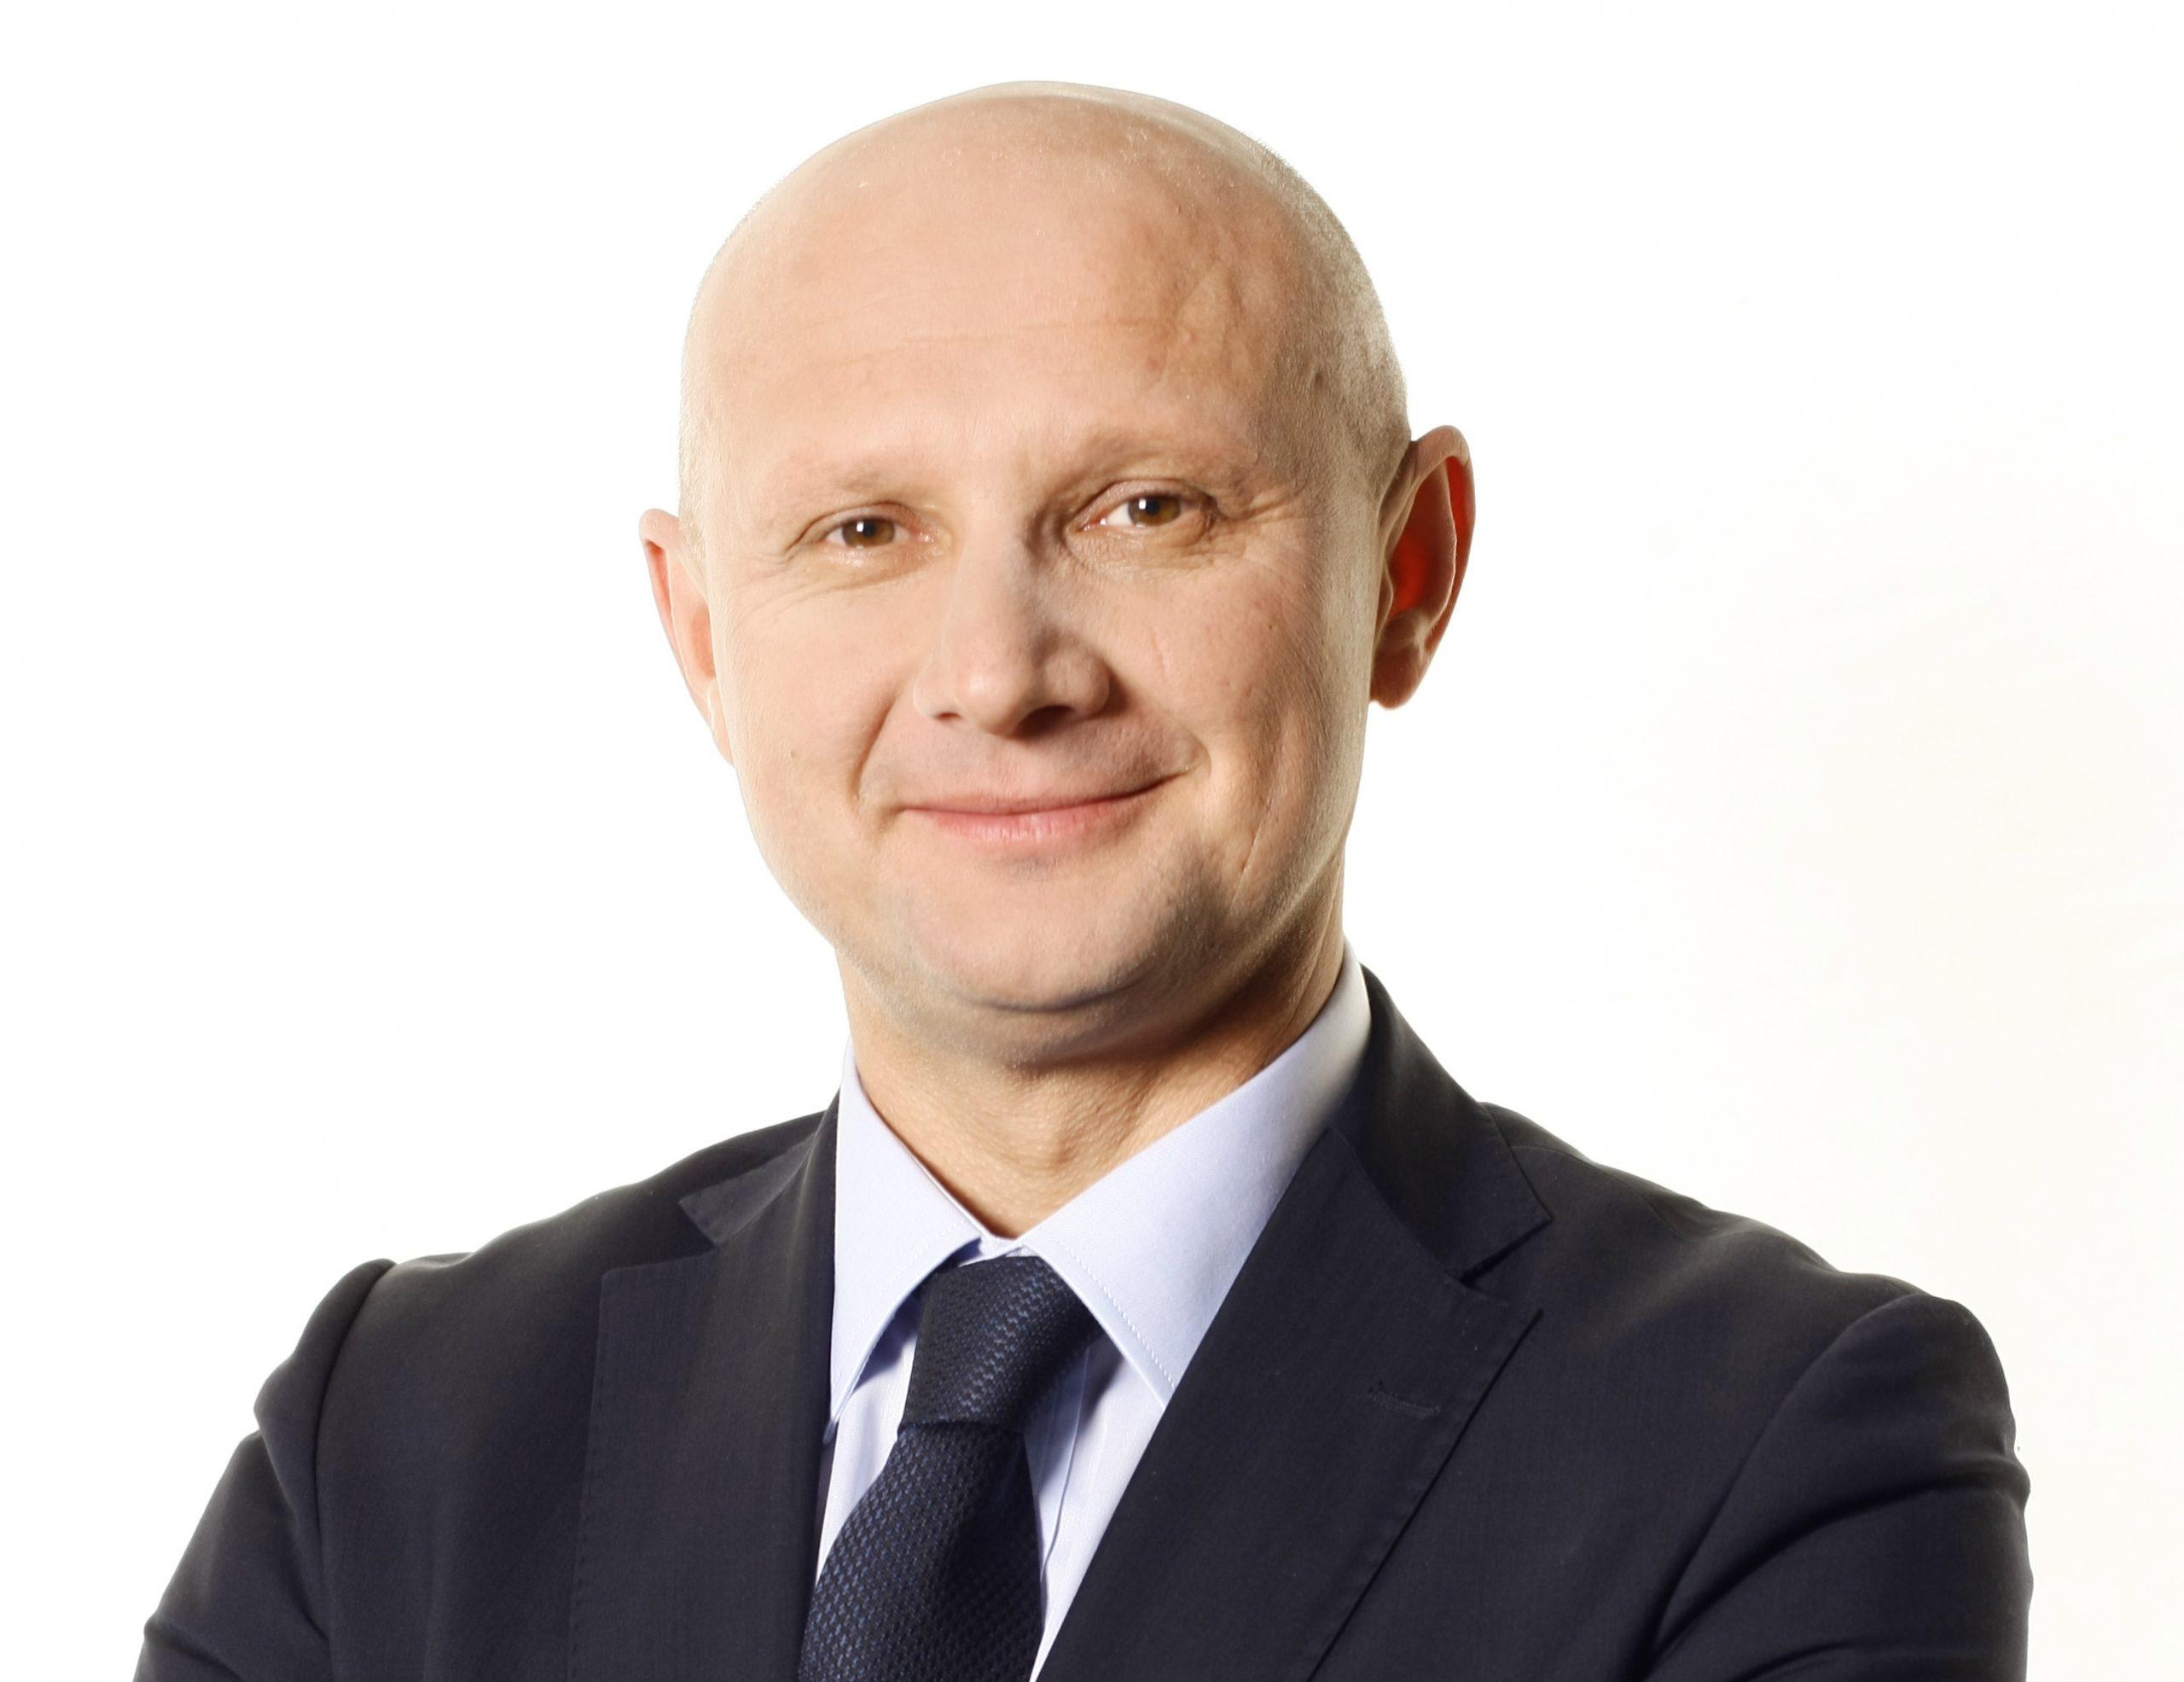 Marek Nizioł, Sales Director Pernod Ricard Polska